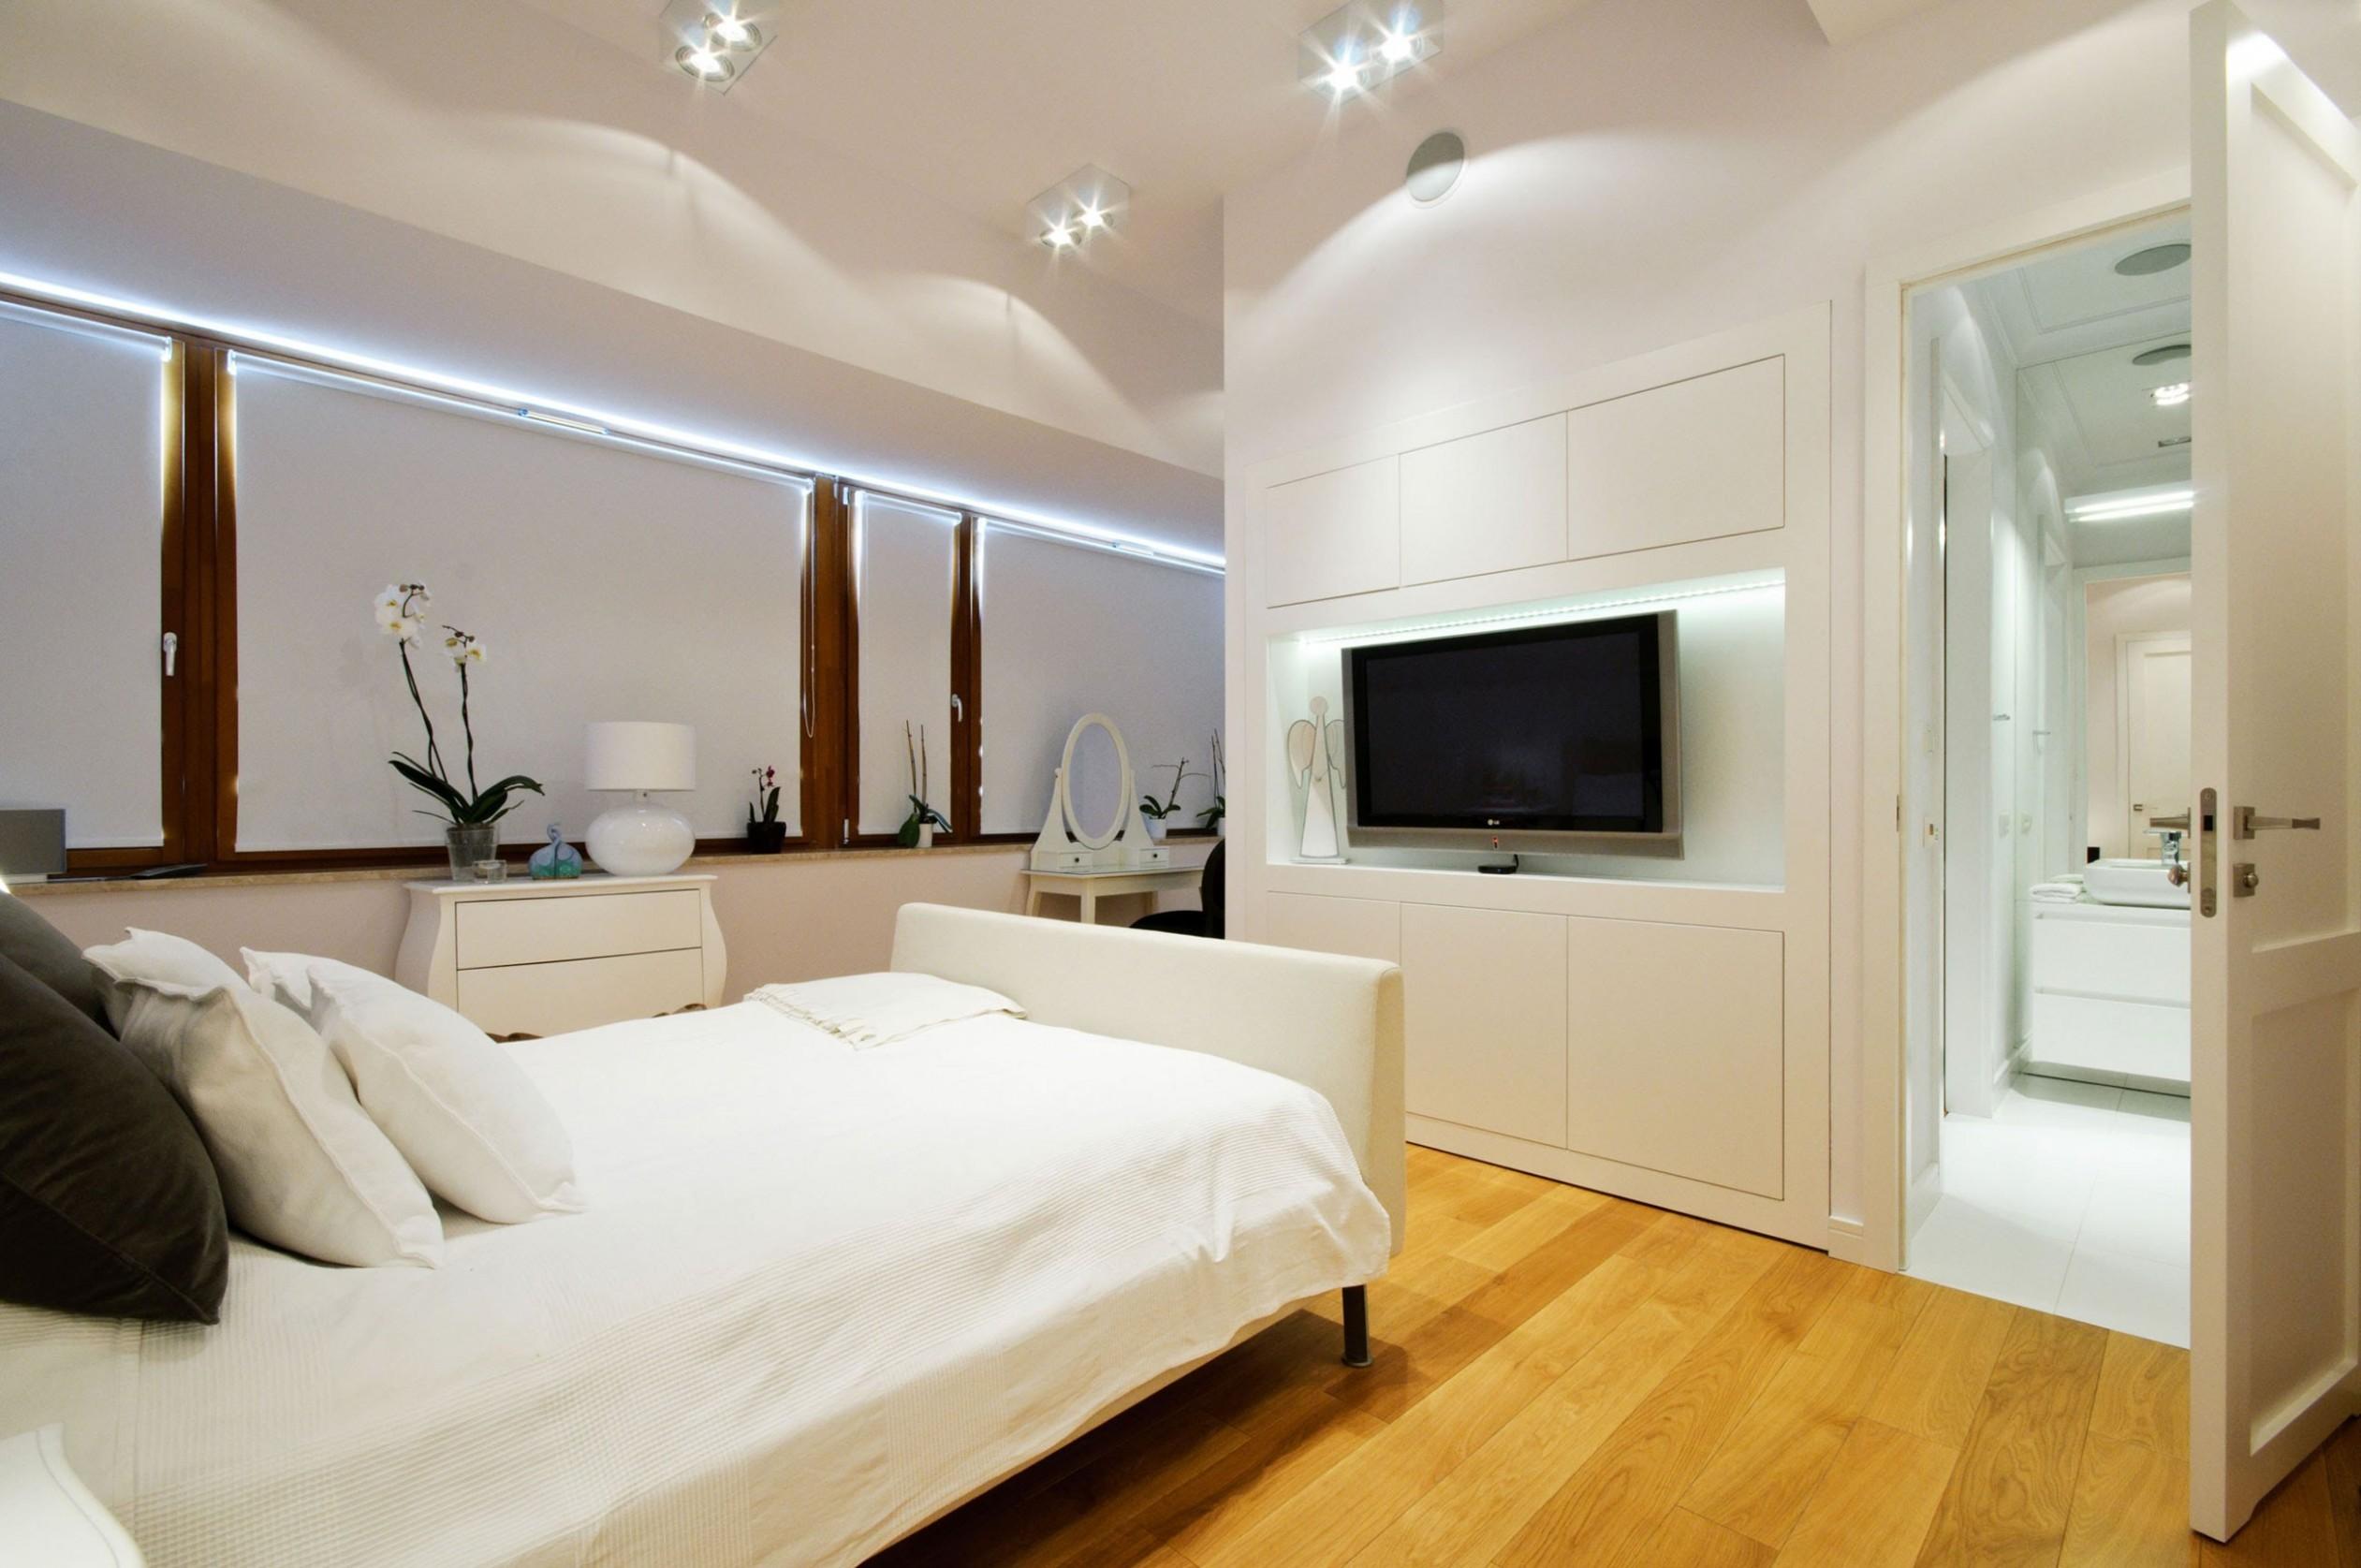 Bedroom With Tv Design Ideas Walls Light Blue Designs Stands Home  - Bedroom Ideas With Tv